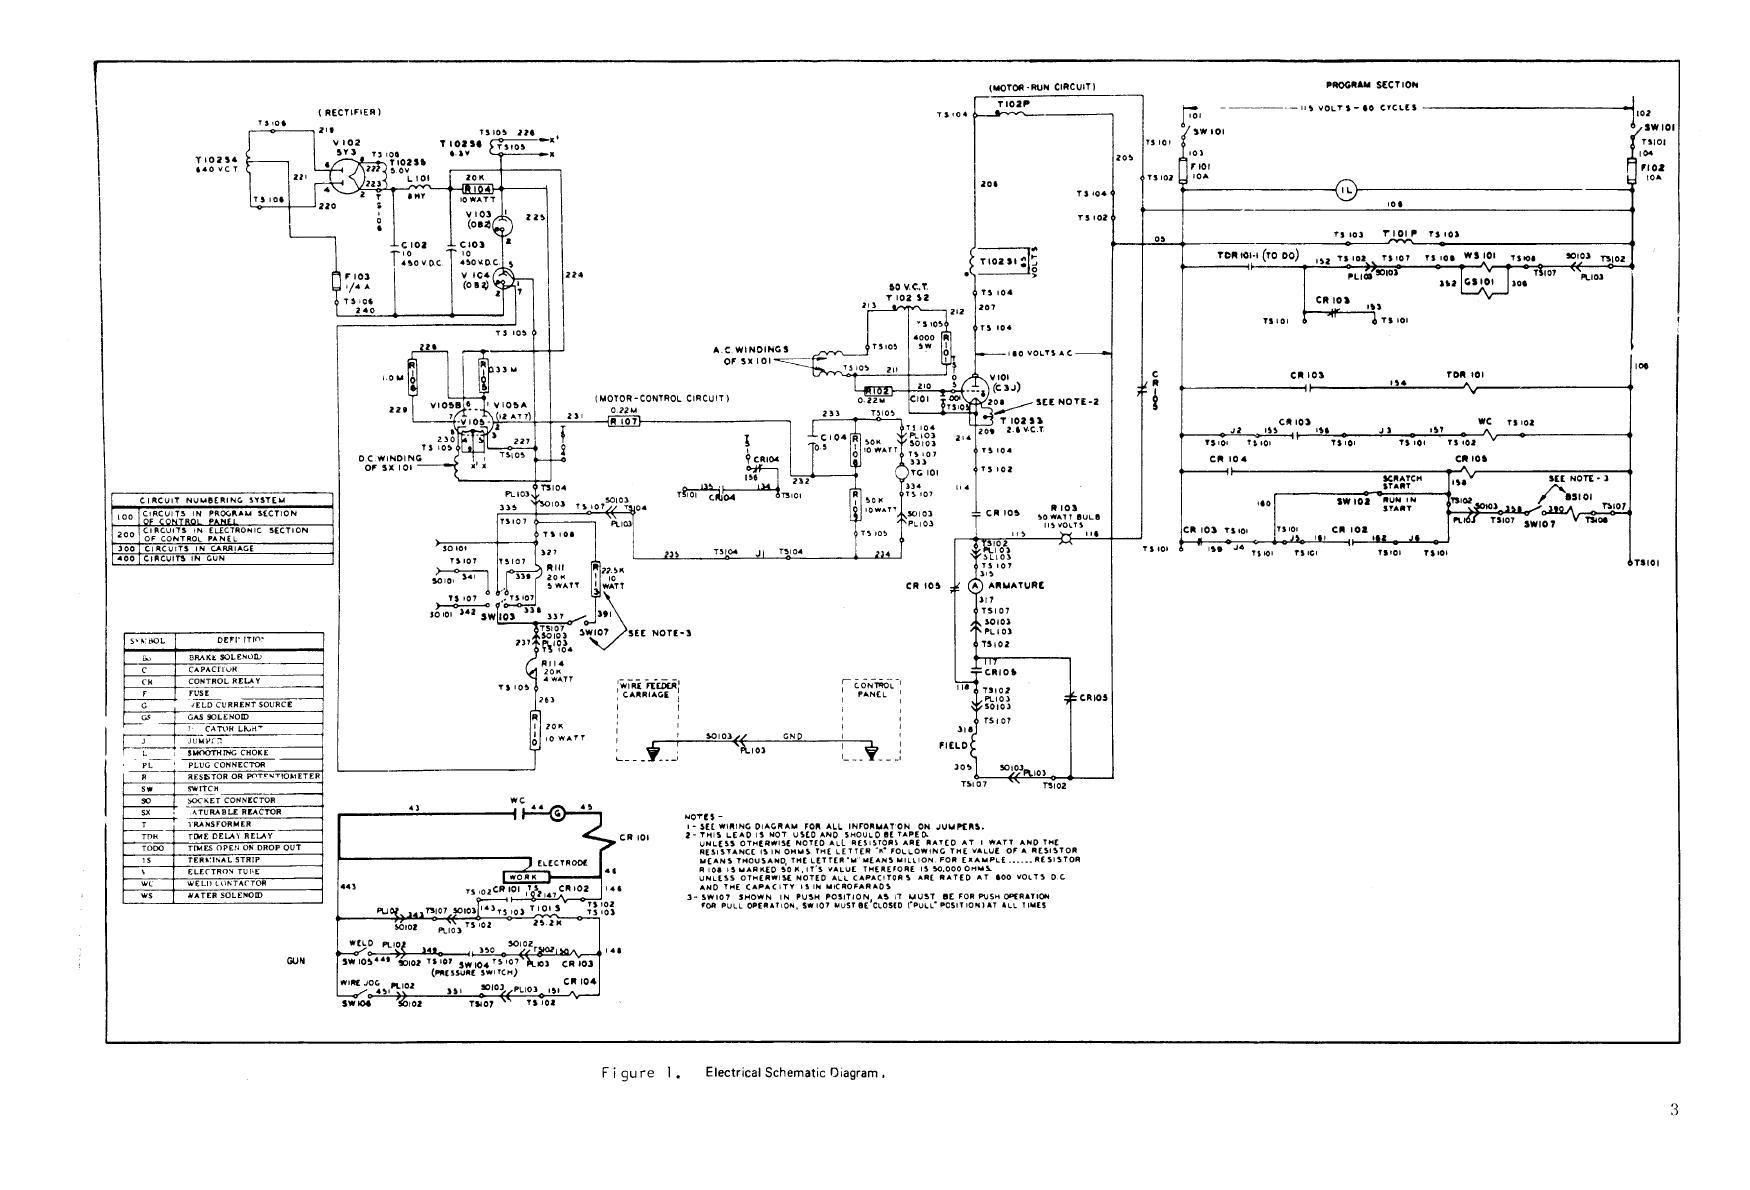 Figure 1 Electrical Schematic Diagram Welding Circuit Tm 5 3431 226 15 Set Arc Inert Gas Shielded Water Cooled Aluminum General Purpose Airco Model 2351 1209 Fsn 731 4163 Manual